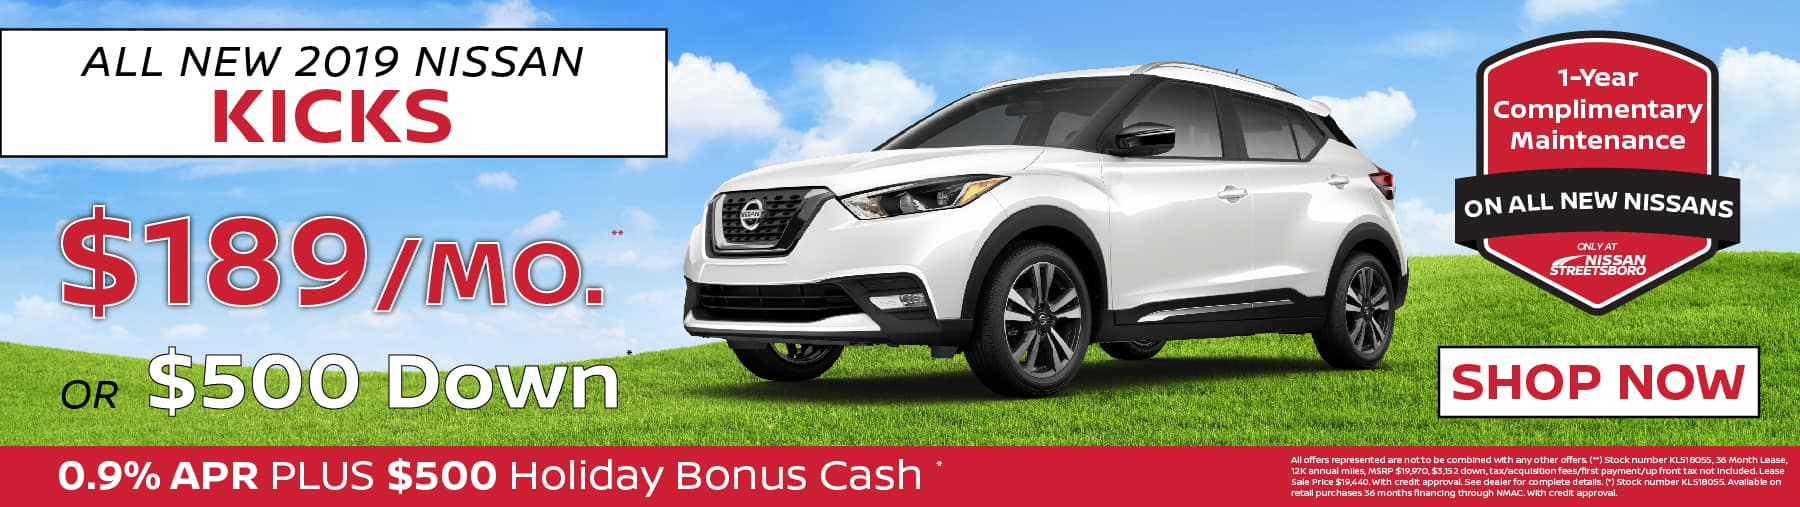 Nissan Kicks Special Ohio